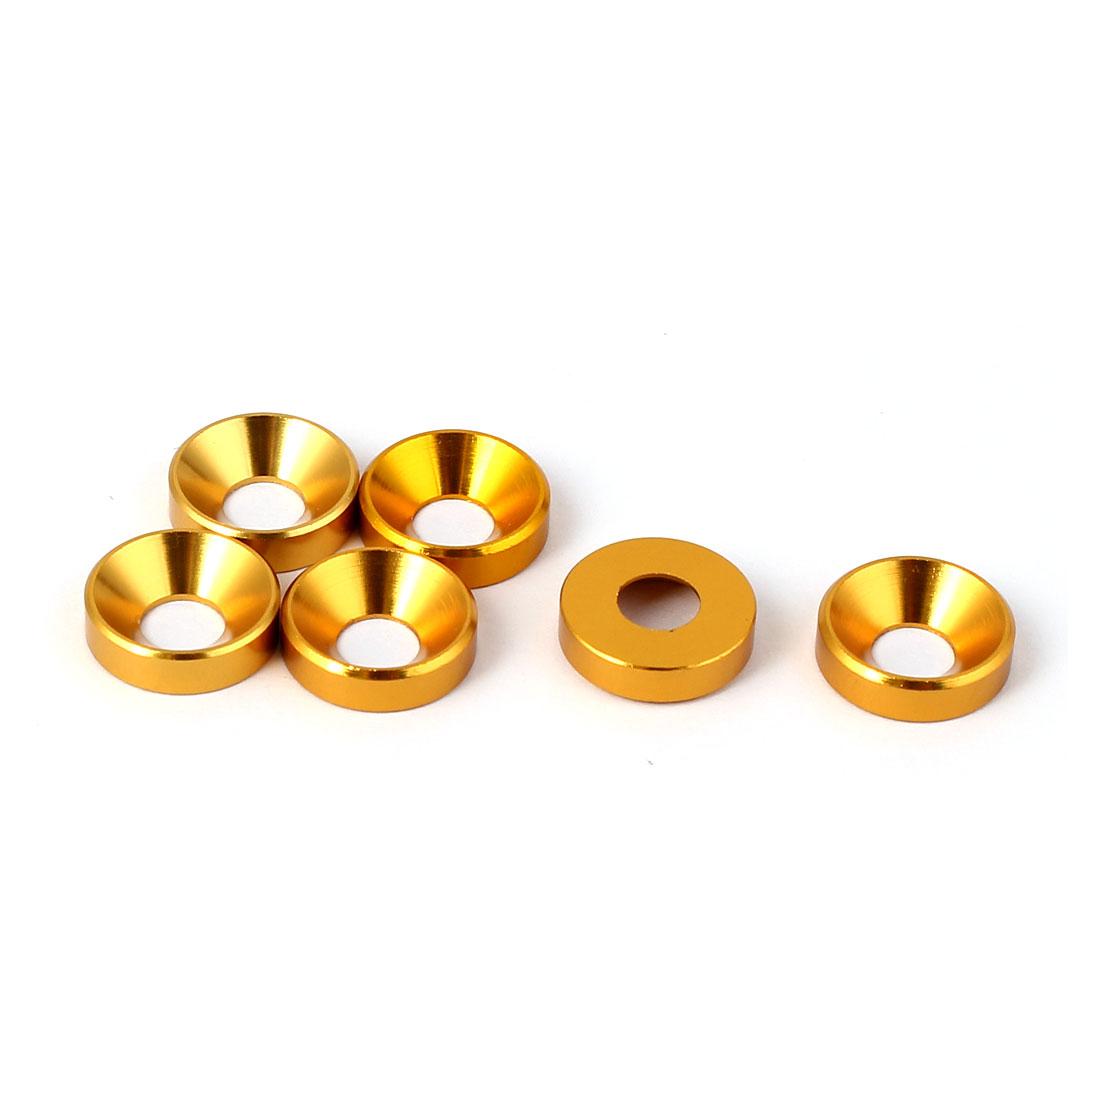 M5 Flat Head Screw Bolt Aluminum Countersunk Washers Gold Tone 6 Pcs